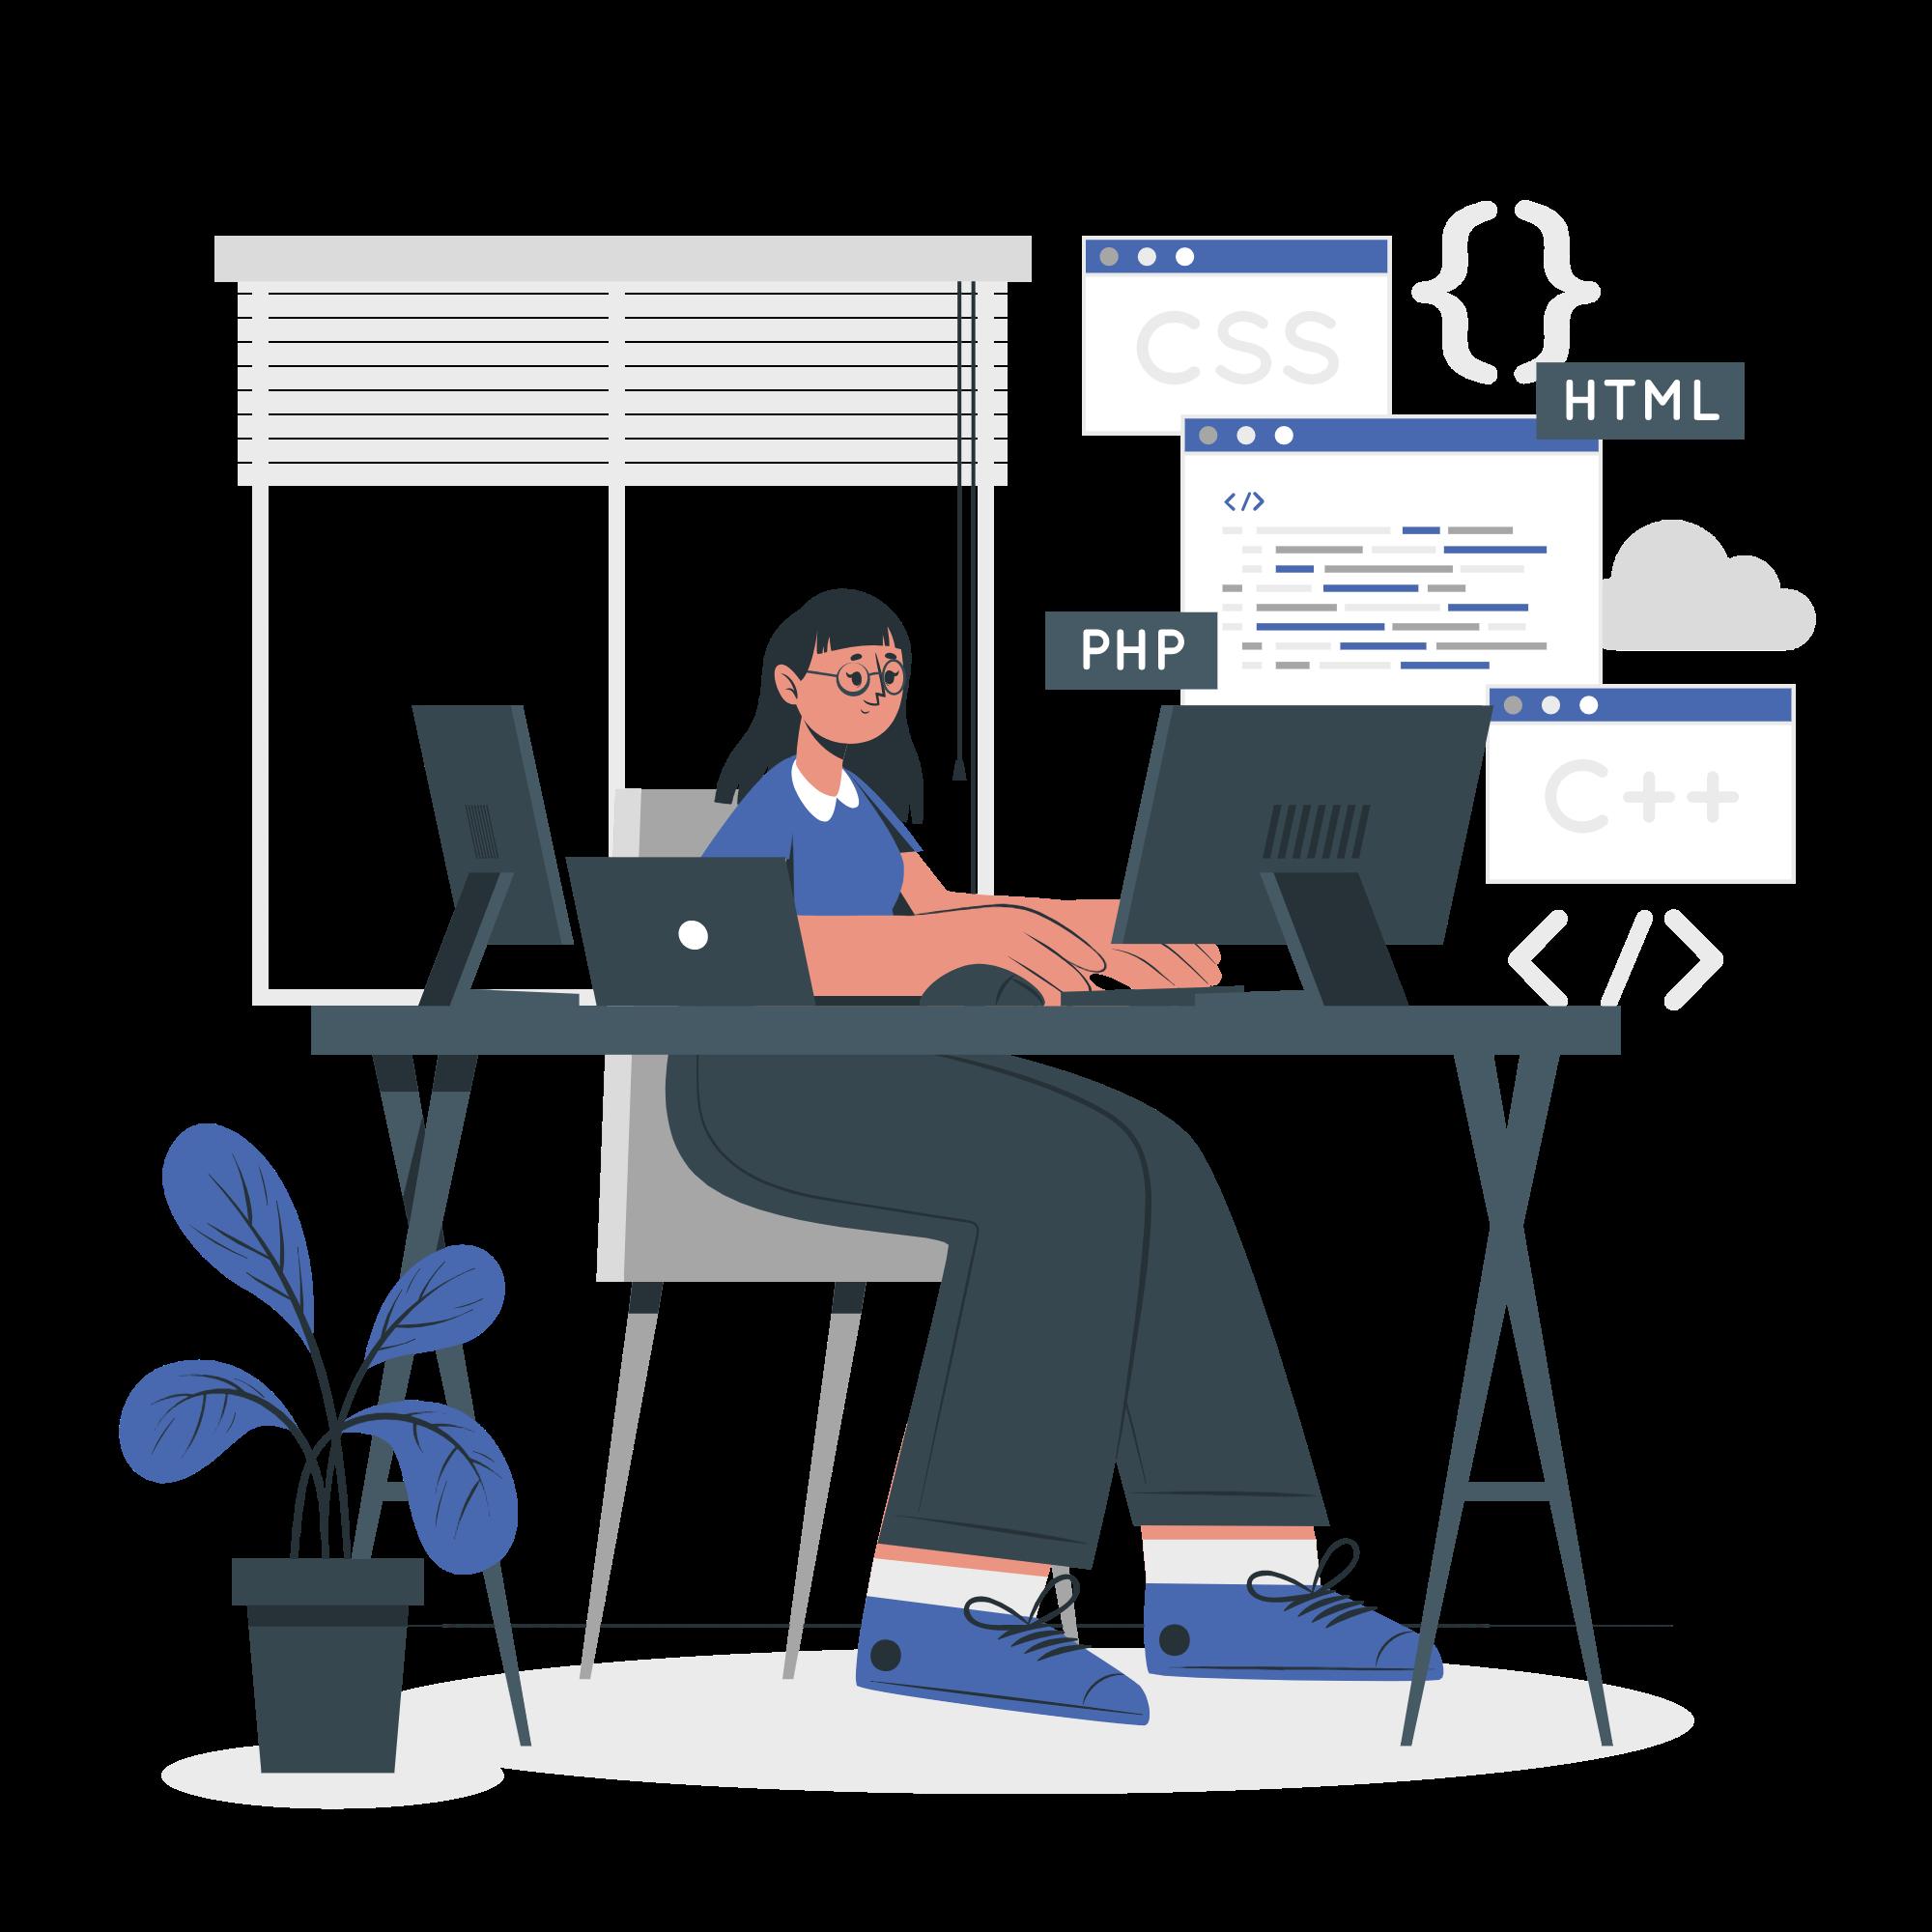 Web developer working on website development vector illustration